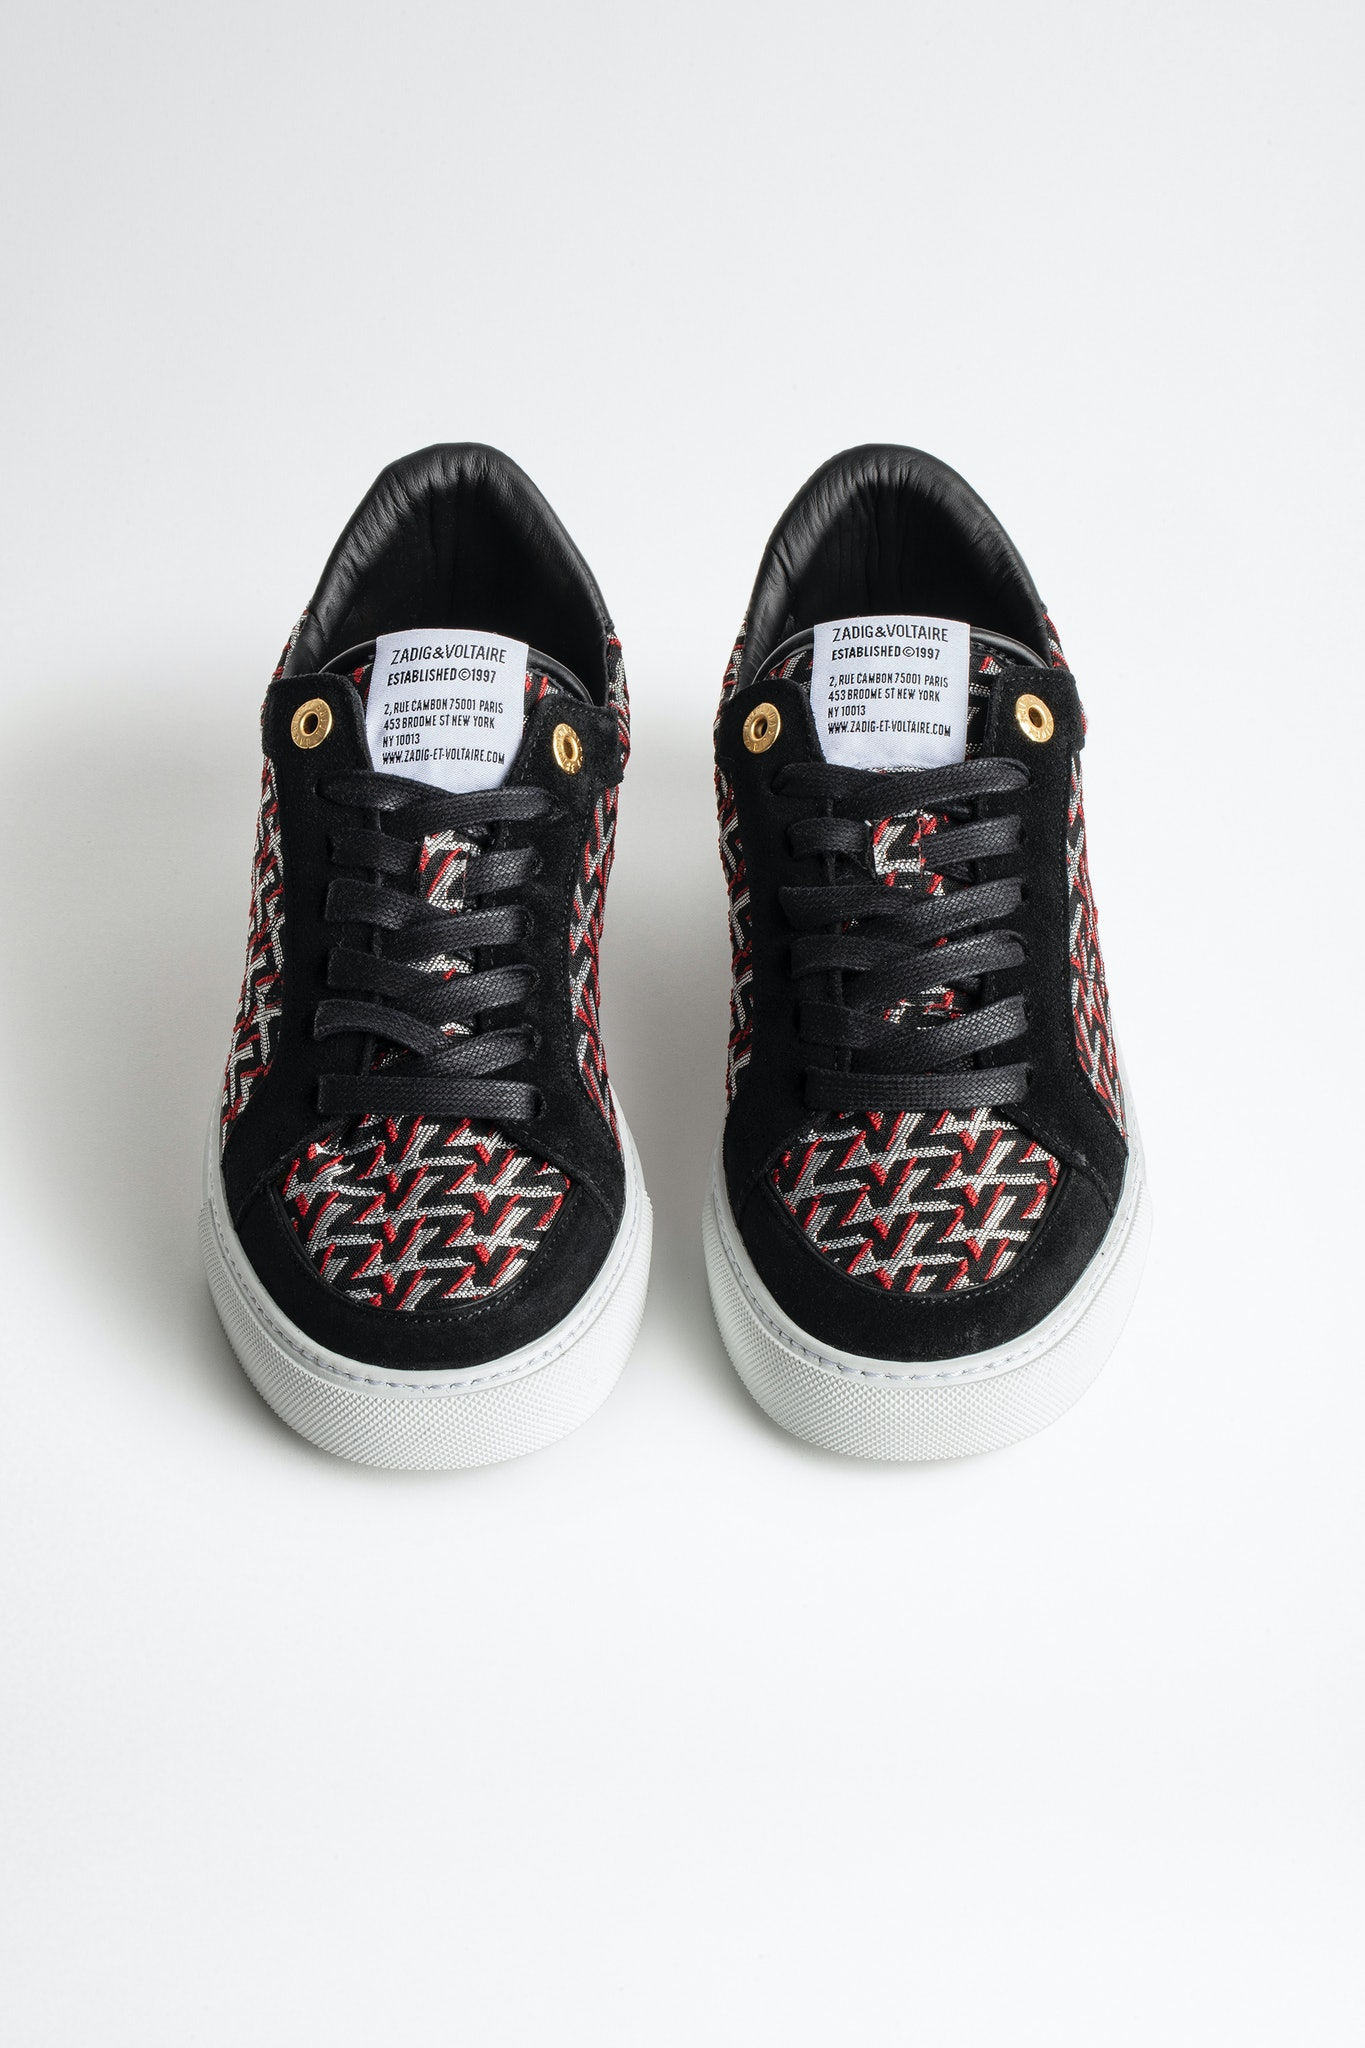 ZV1747 Board Monogram Sneakers